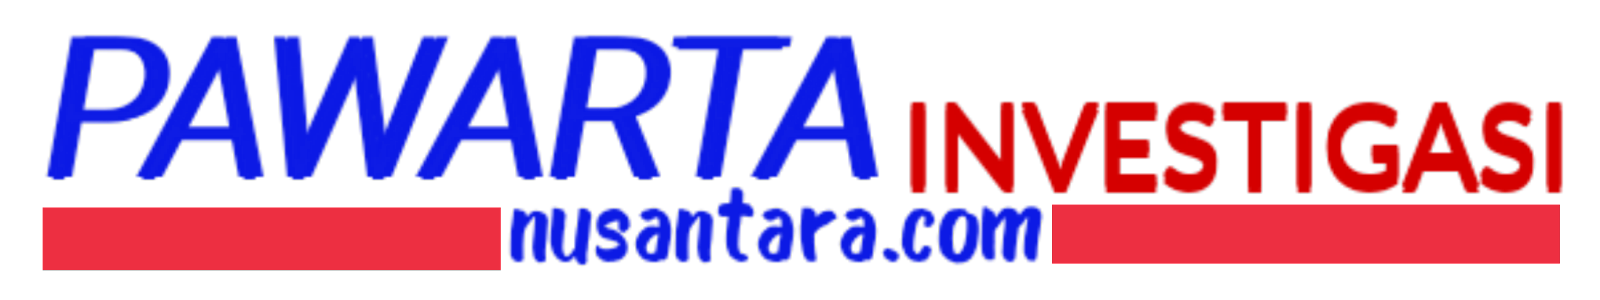 PAWARTA INVESTIGASI Copyright 2021